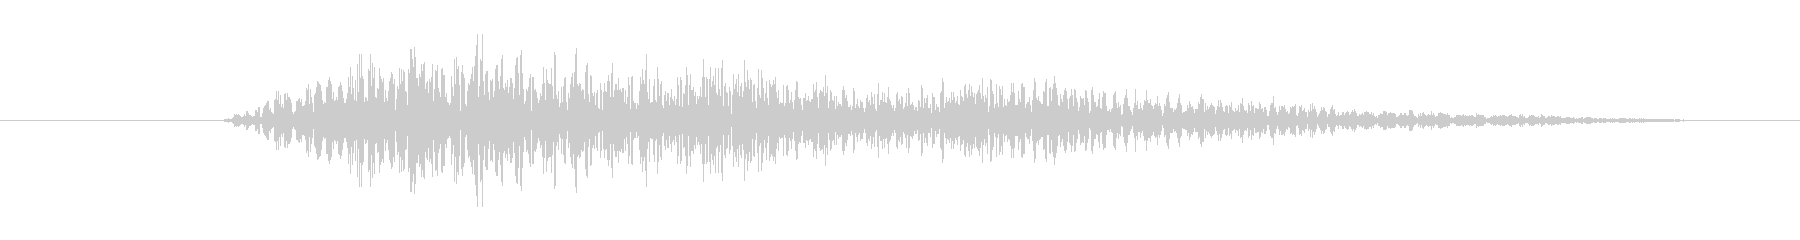 FX アラーム01の未再生の波形